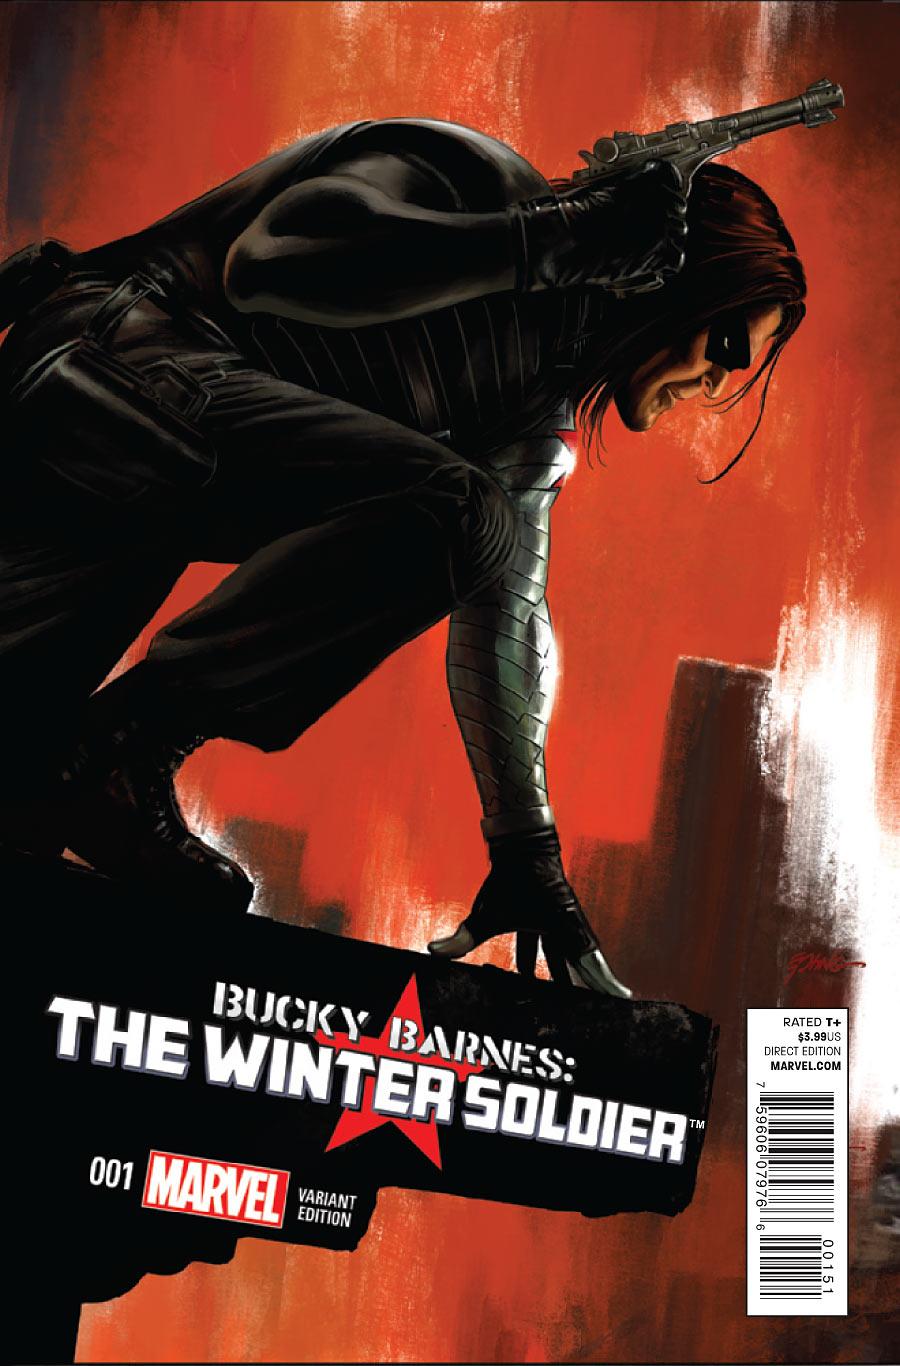 Bucky Barnes Winter Soldier #1 variant